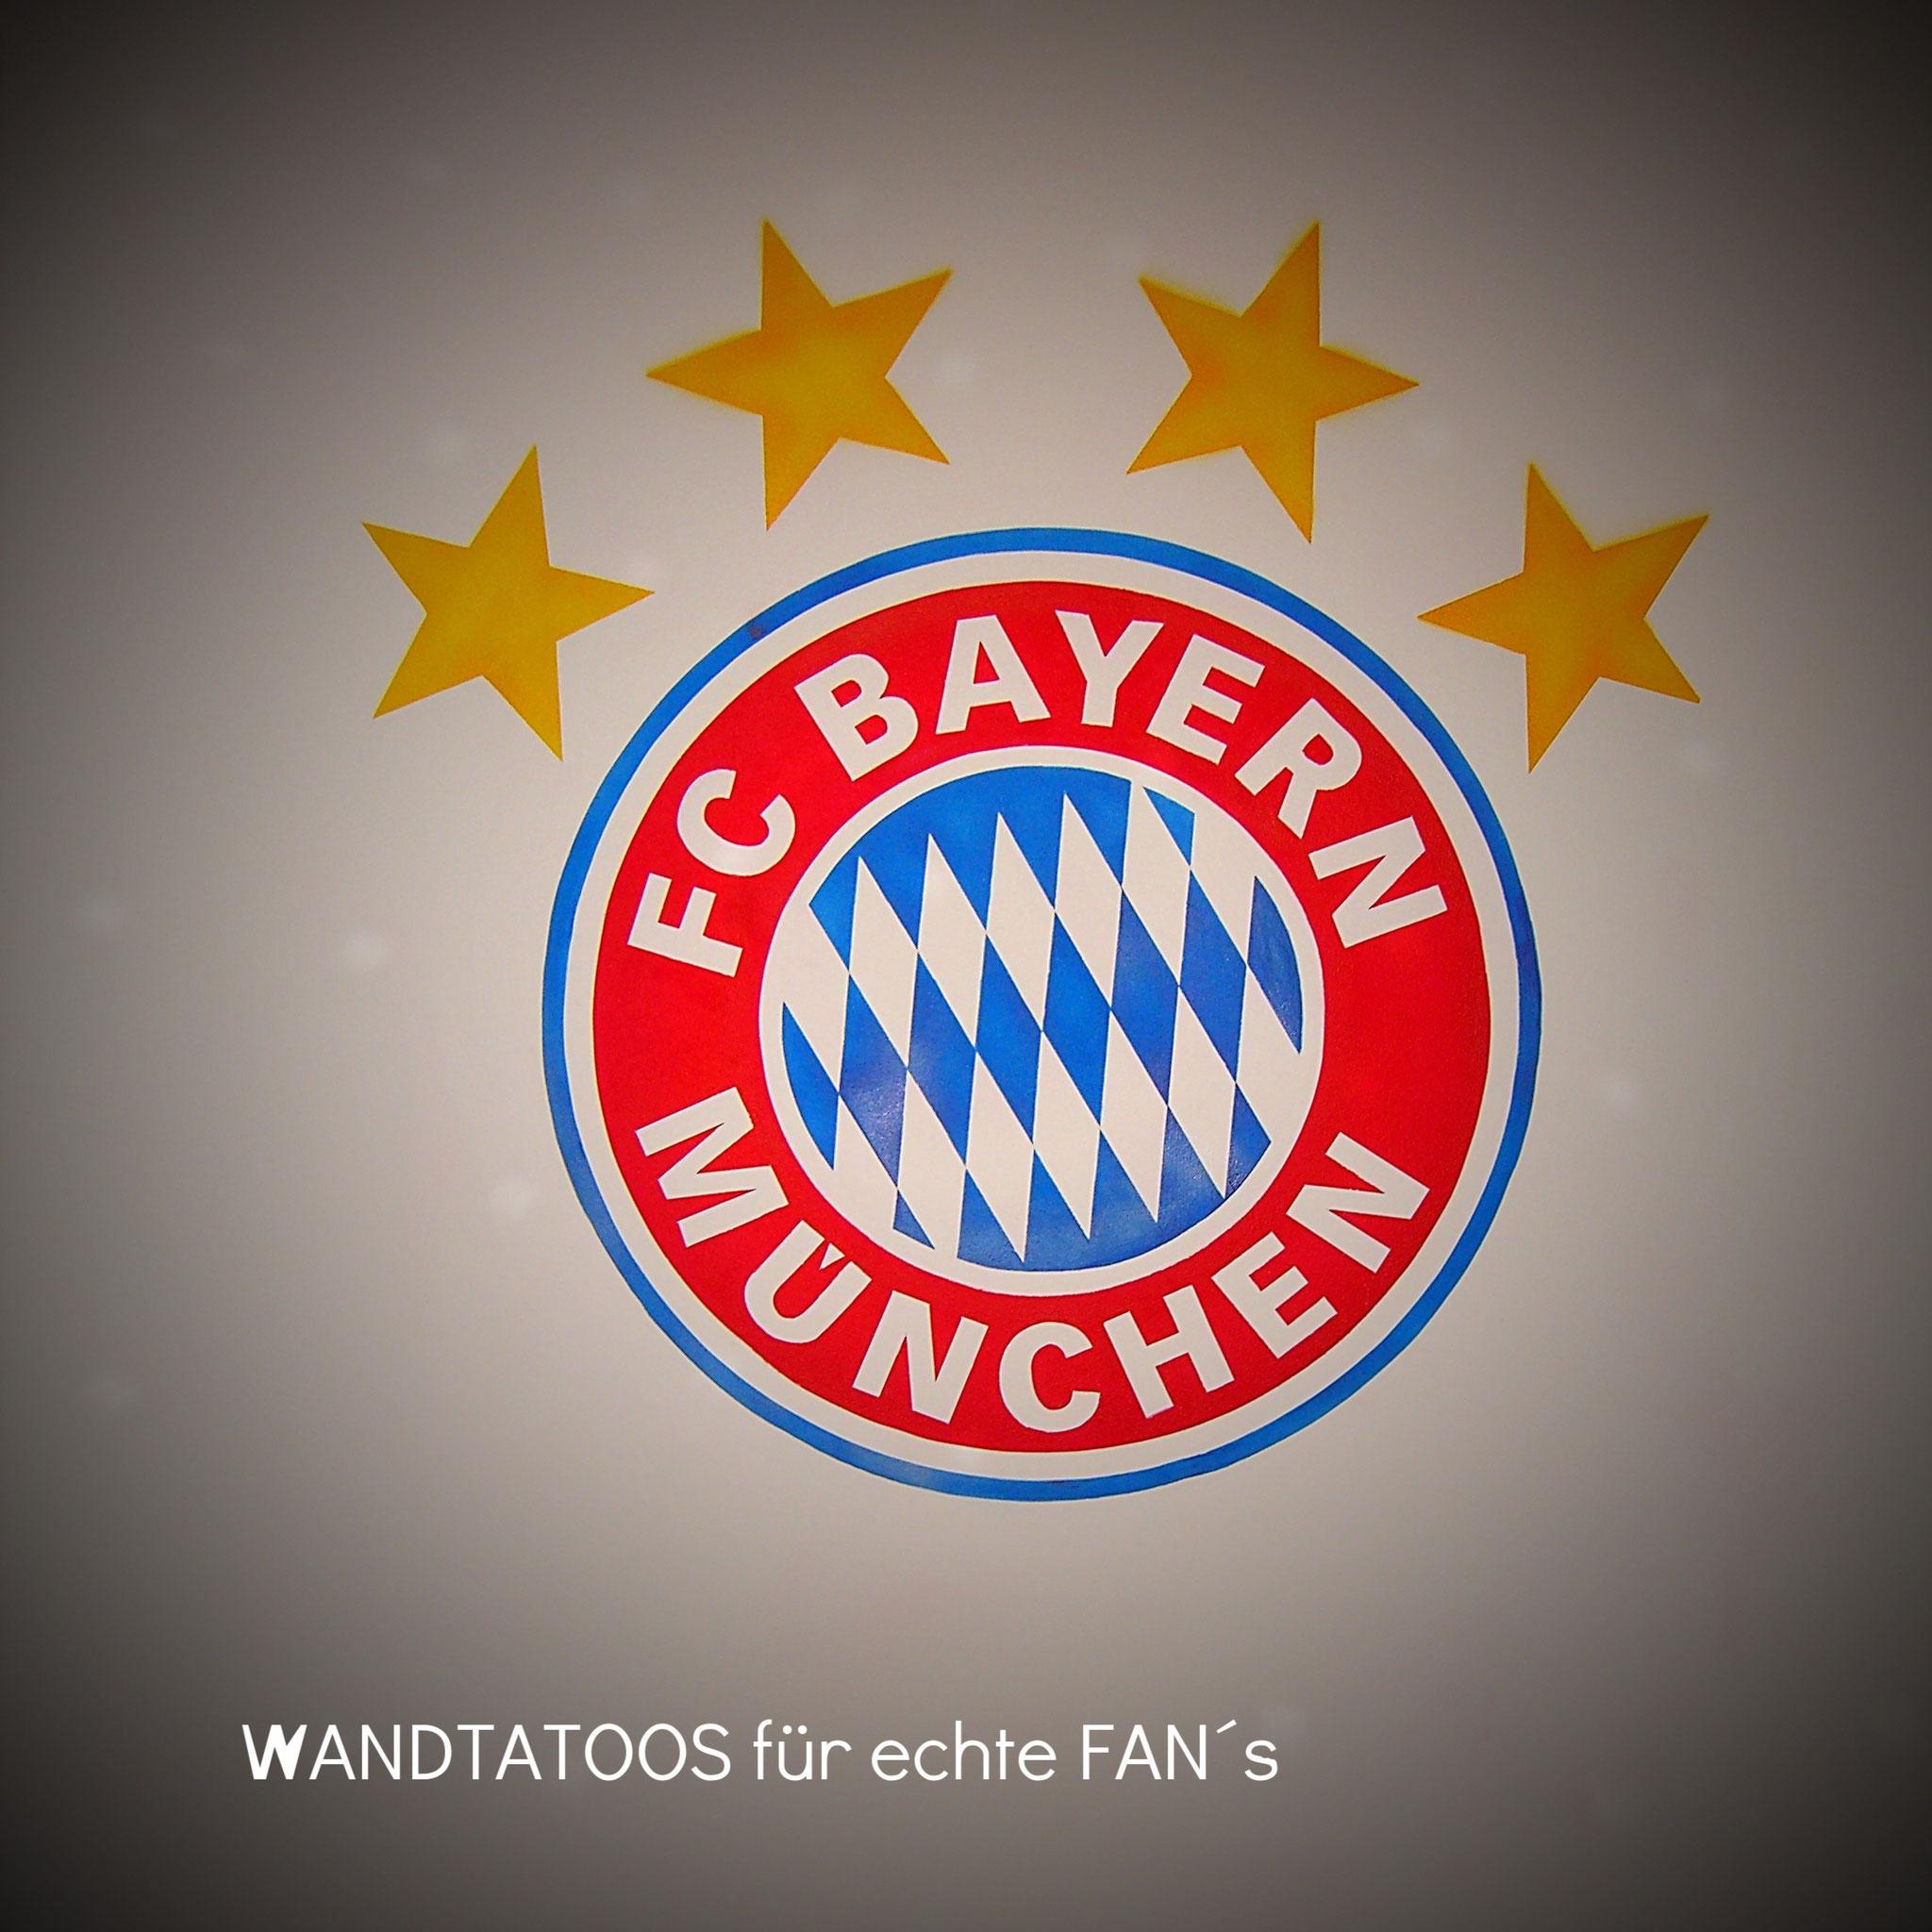 Fussball Logo Tatoos fürs Kinderzimmer - Malerei Wagner Persenbeug